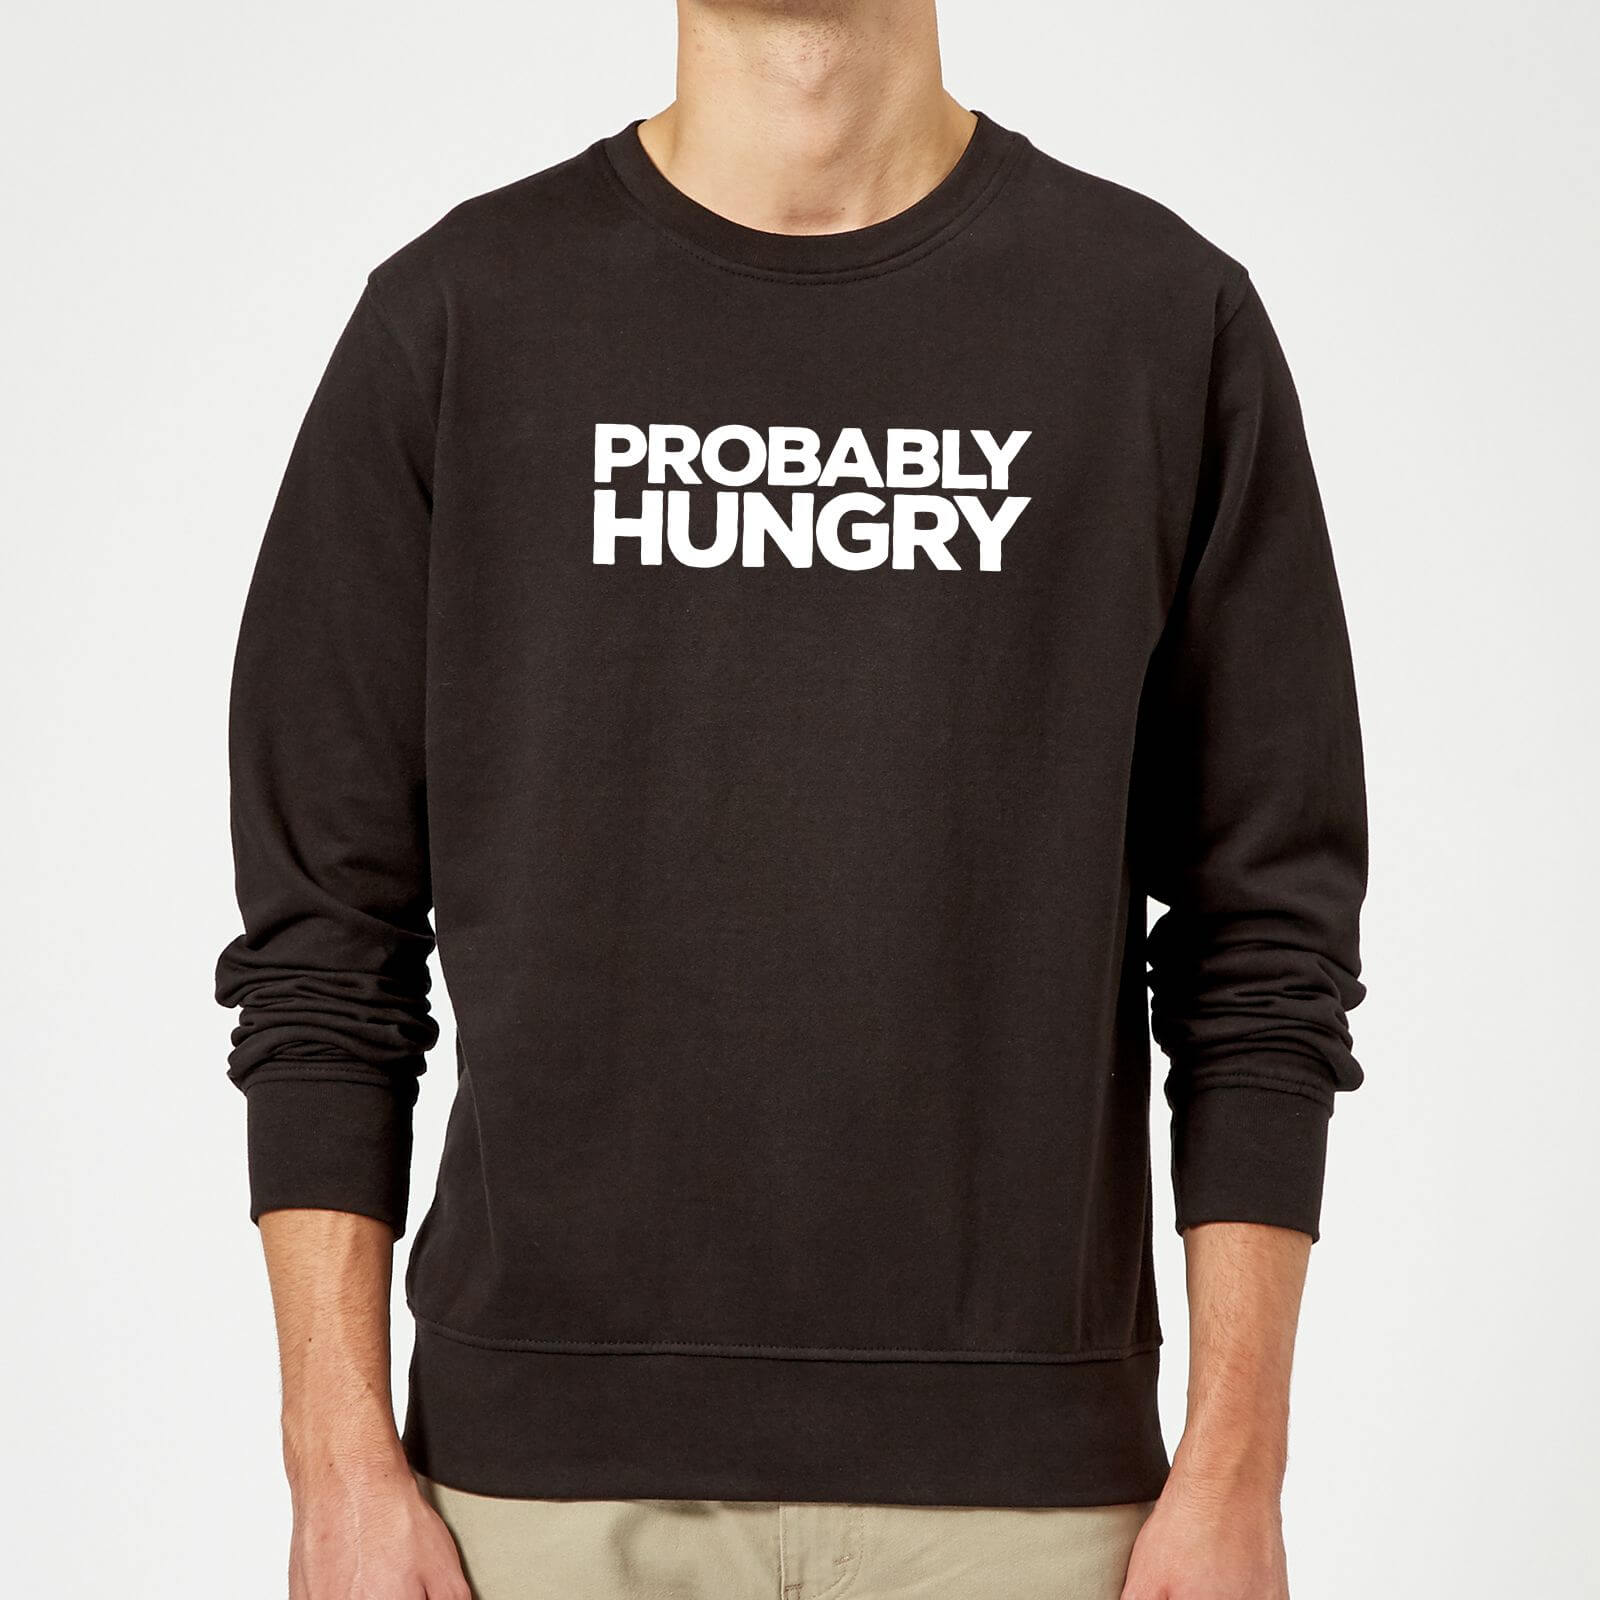 78aa6f3332fa Probably Hungry Sweatshirt - Black Clothing